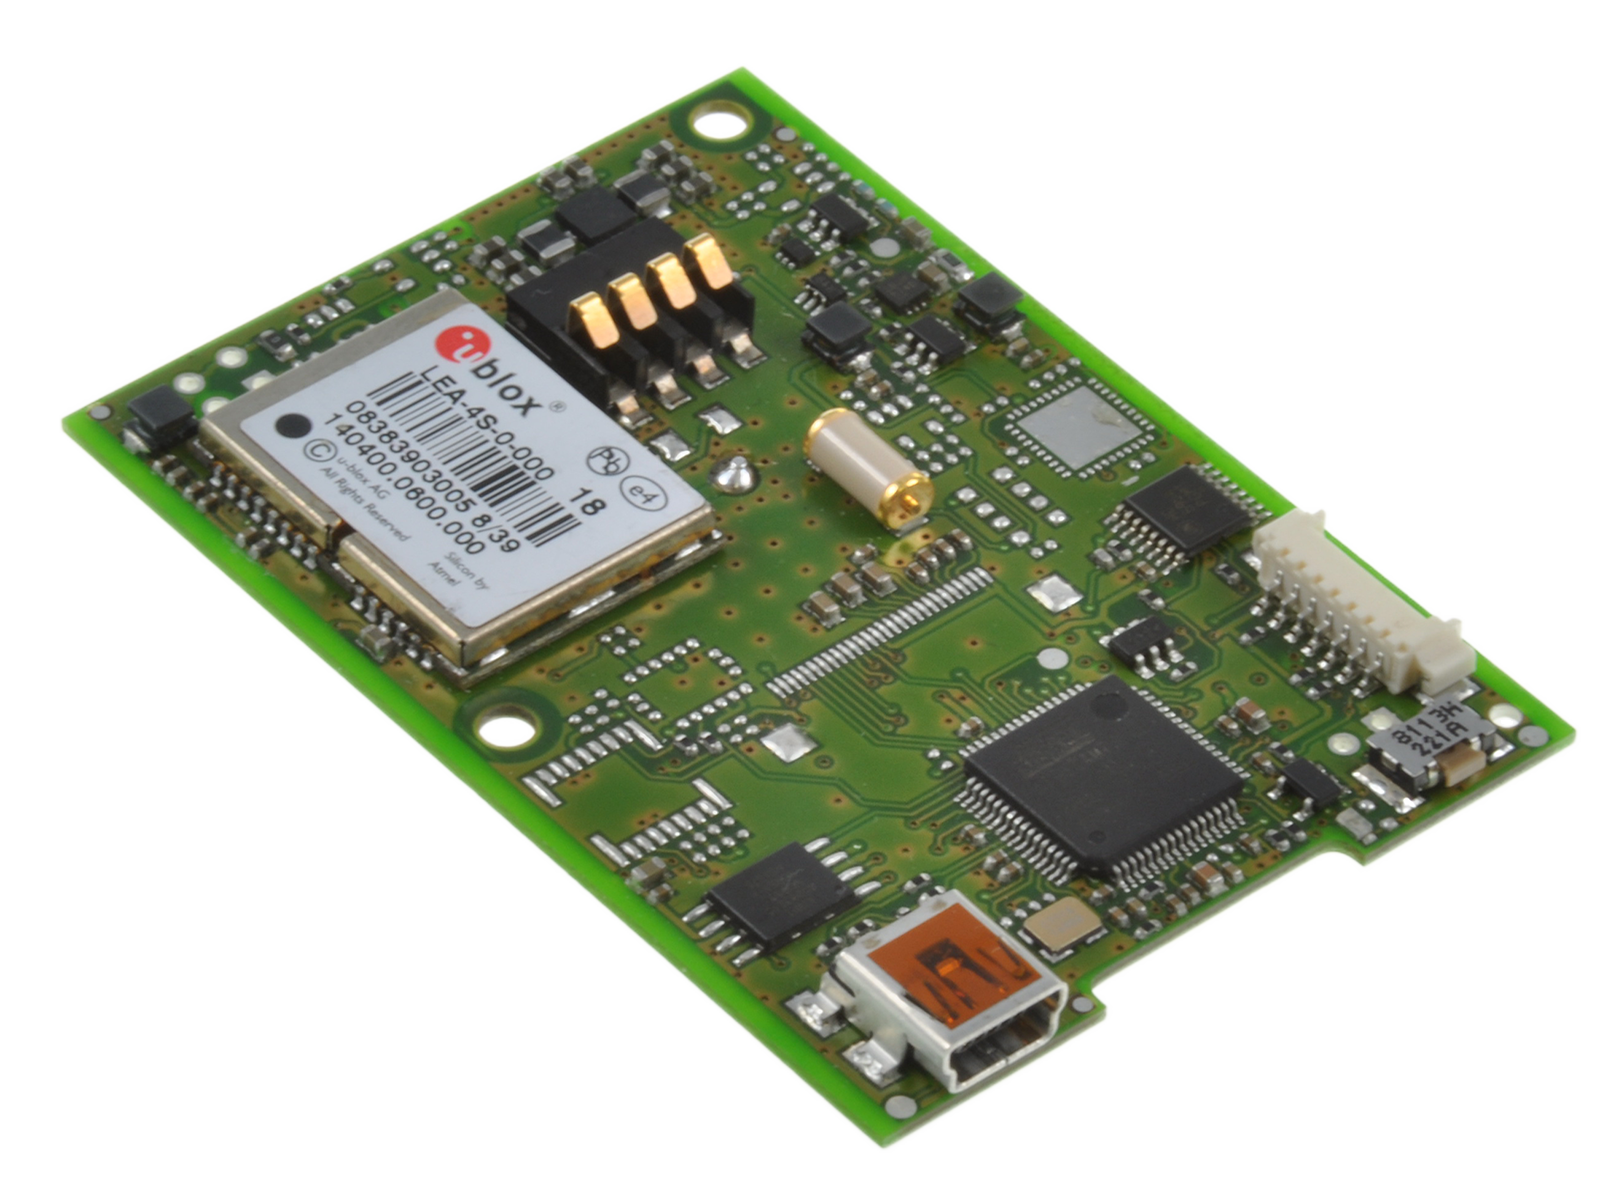 GPS Data Logger (ZHAW) - Print